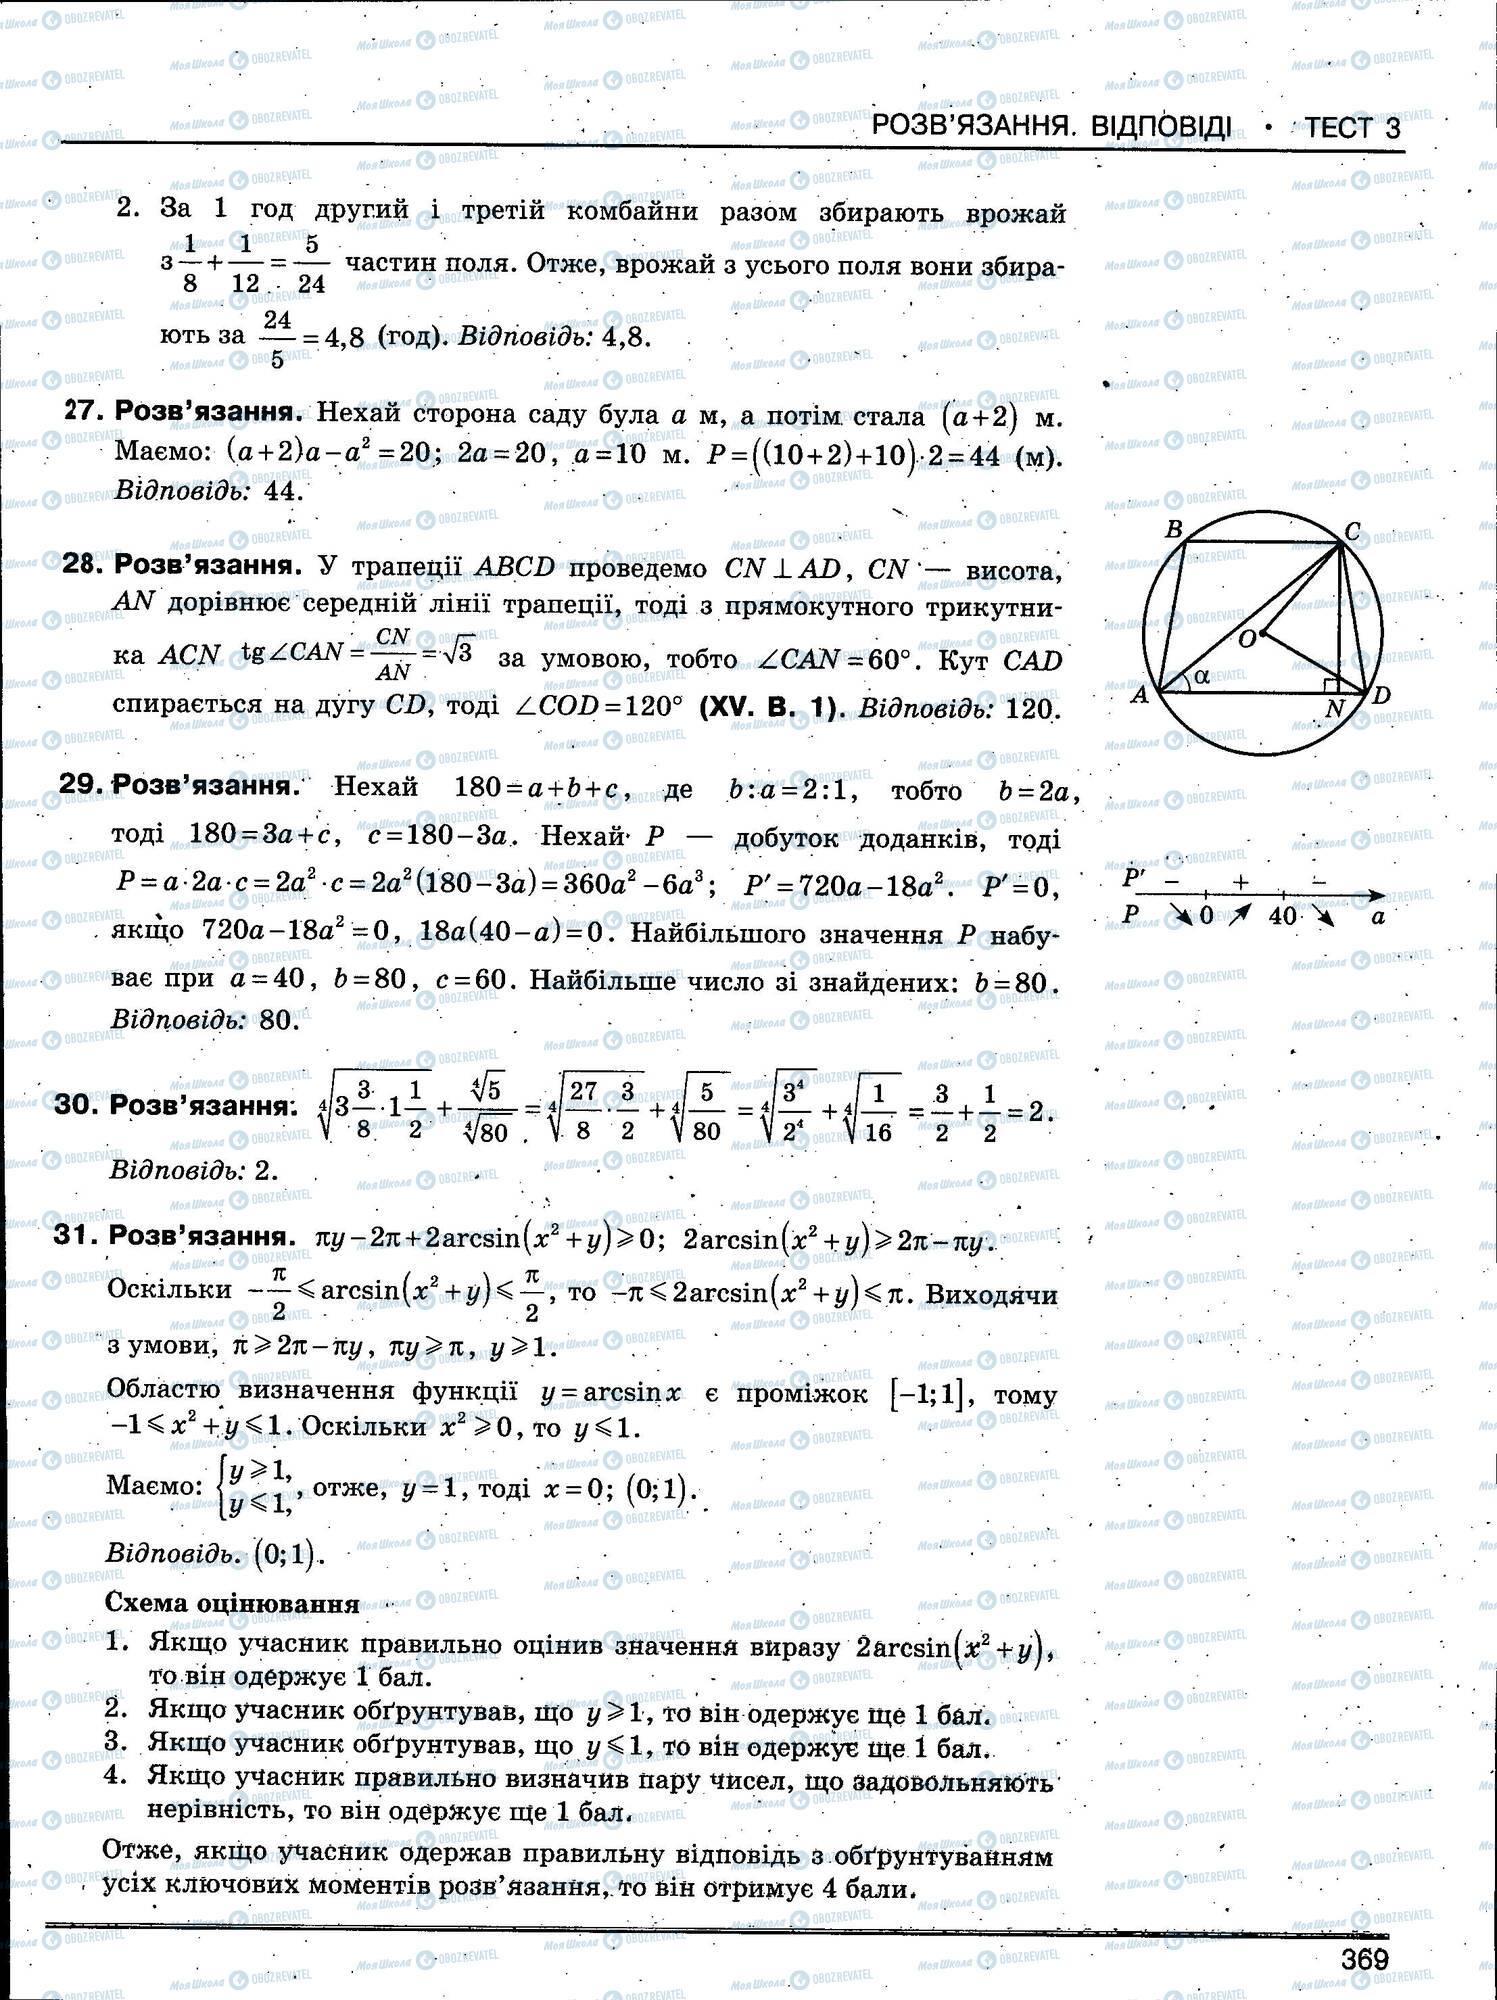 ЗНО Математика 11 класс страница 369